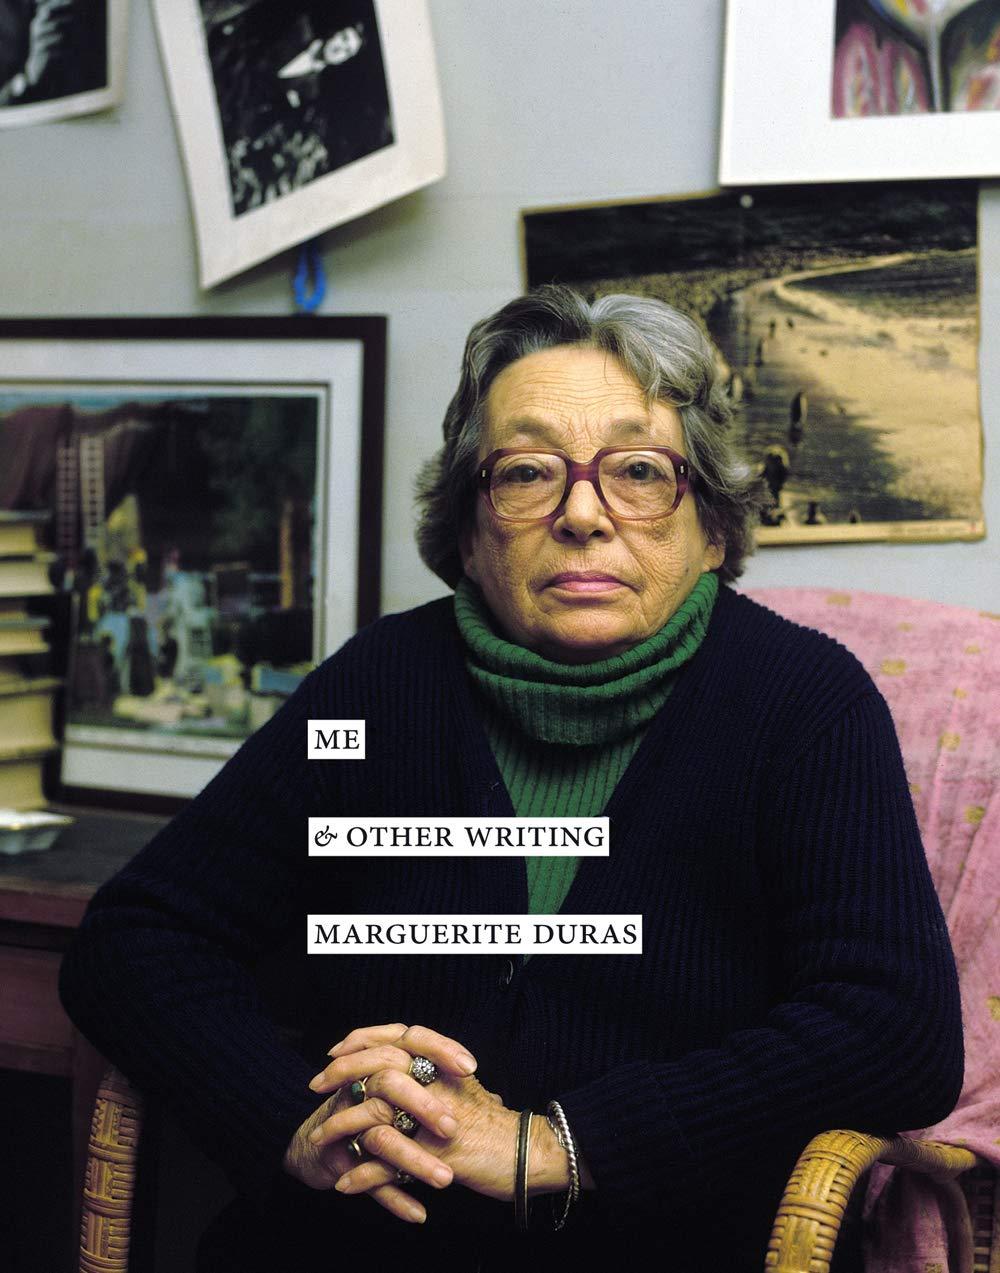 Me Other Writing Duras Marguerite 9781948980029 Amazon Com Books